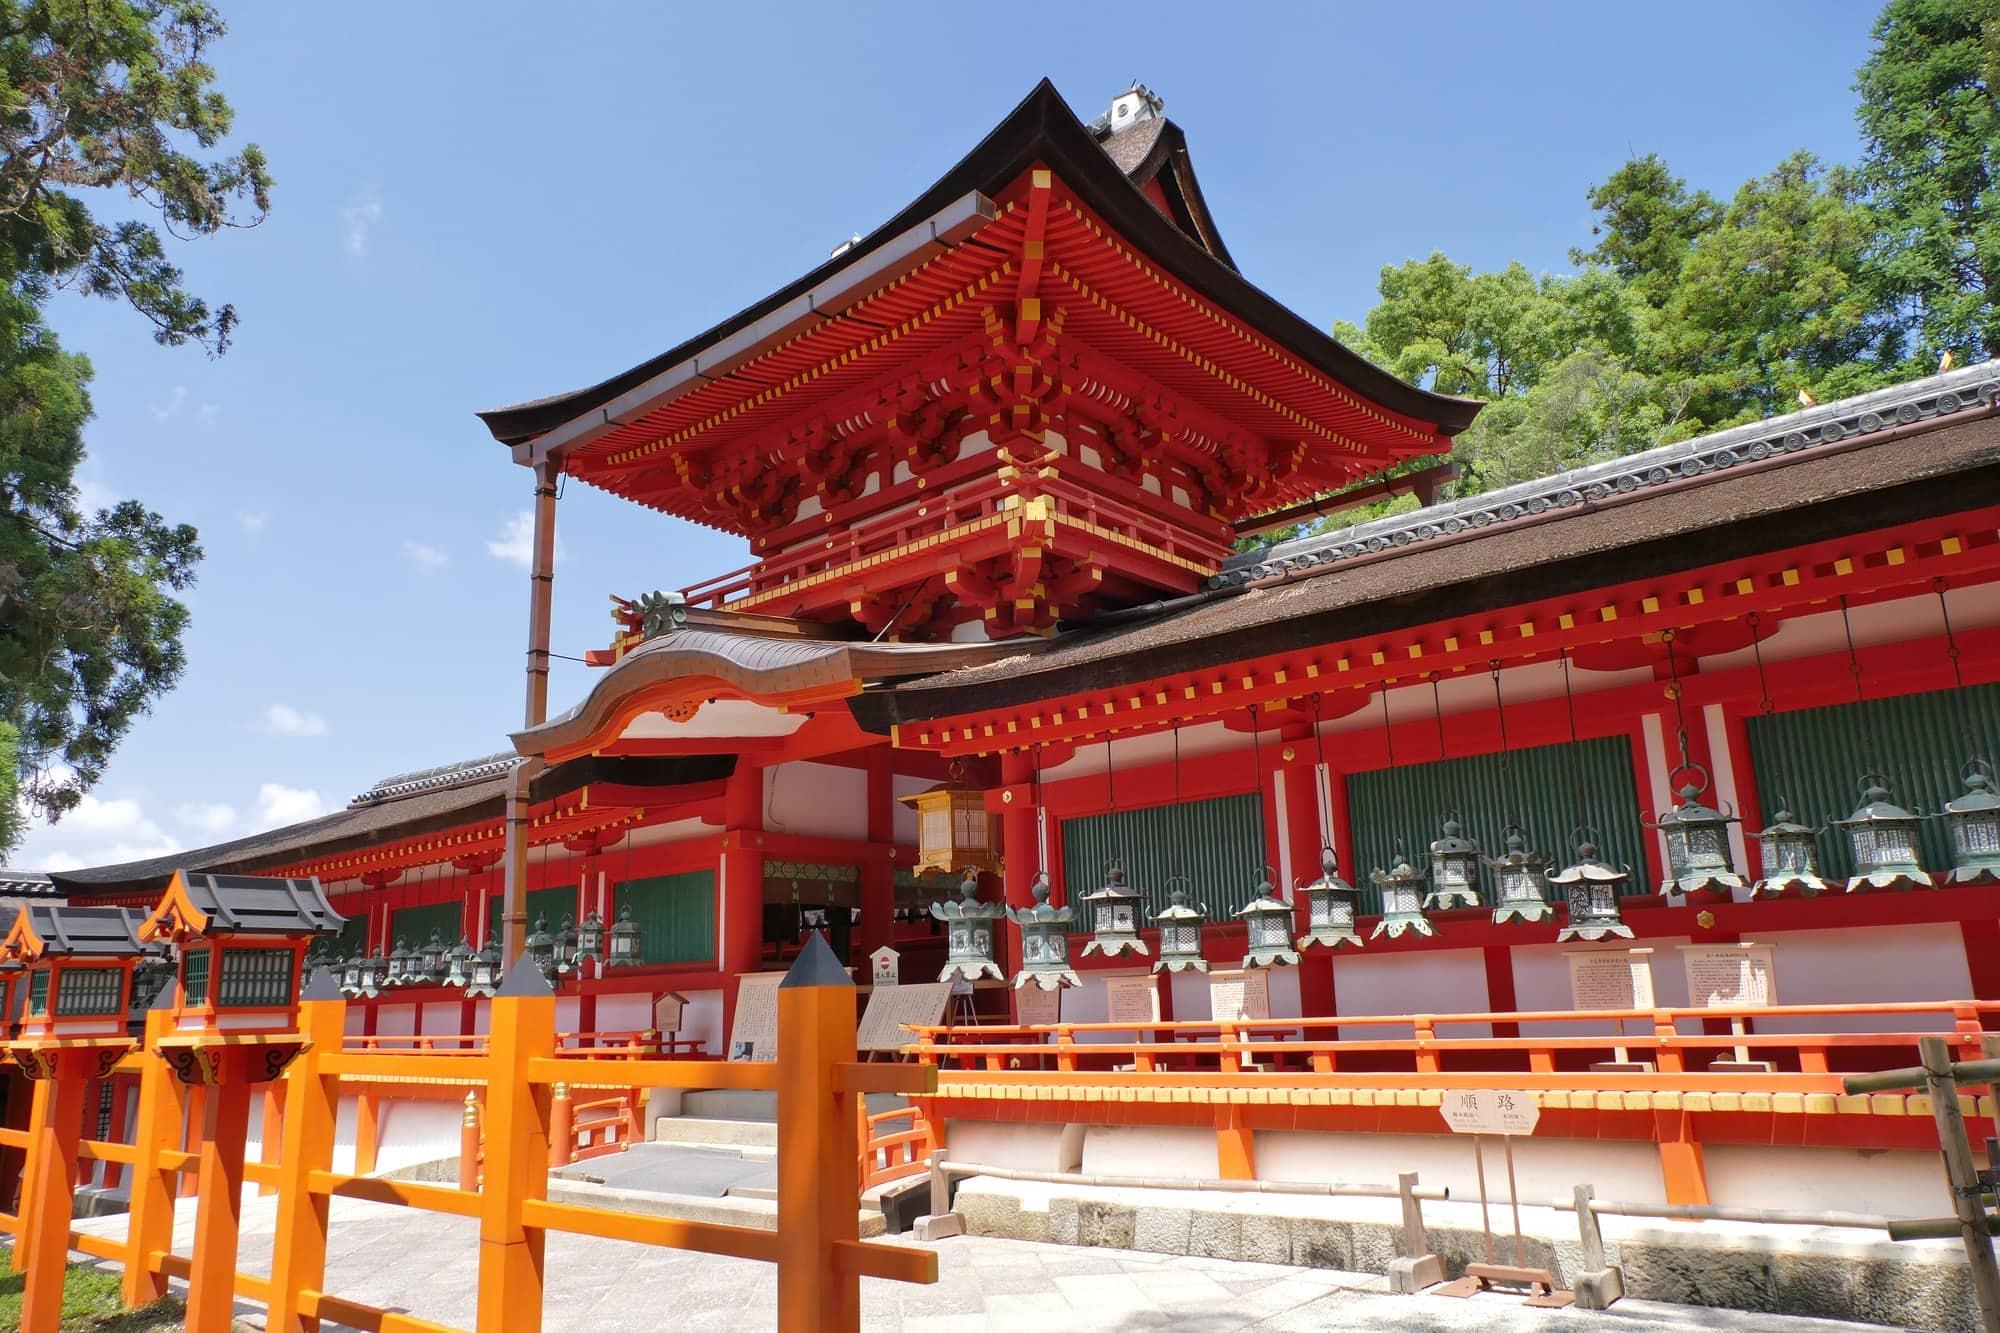 春日大社 THE GATE 日本の旅行観光マガジン・観光旅行情報掲載